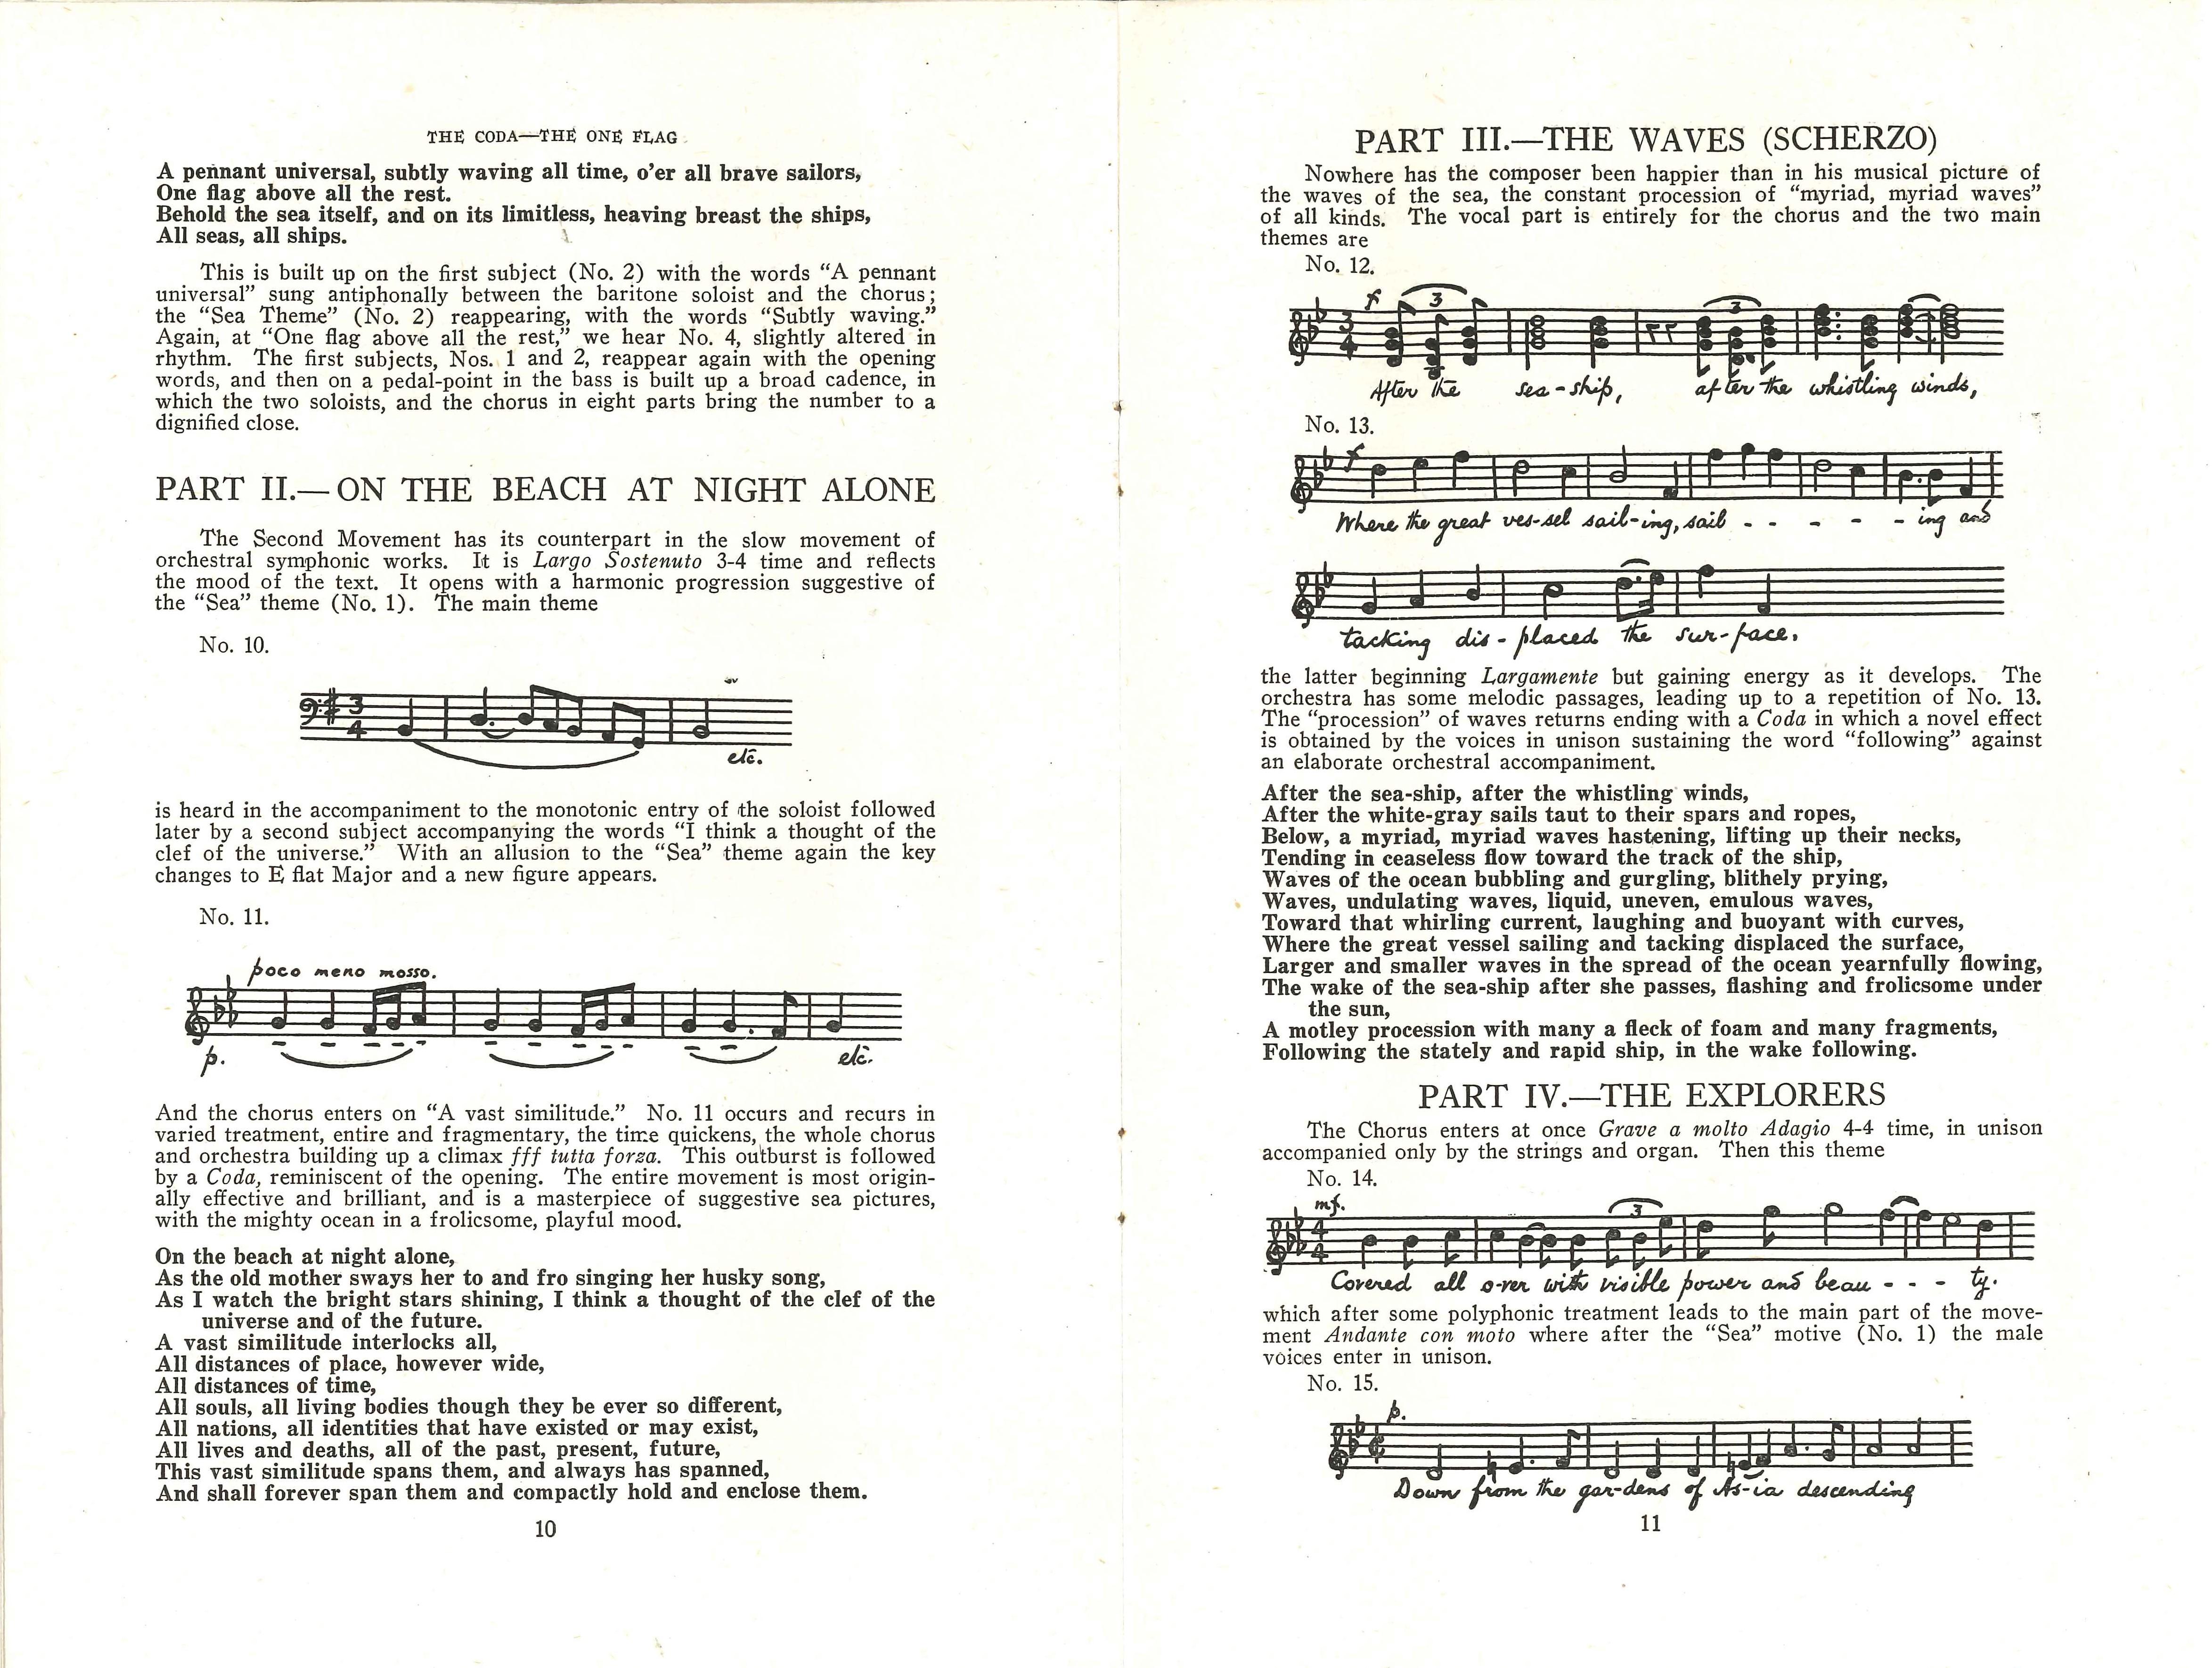 The Toronto Mendelssohn Choir, H.A. Fricker, Conductor: Twenty Fourth Season: Monday Evening, April 11th, 1921. Toronto: Toronto Mendelssohn Choir, 1921.